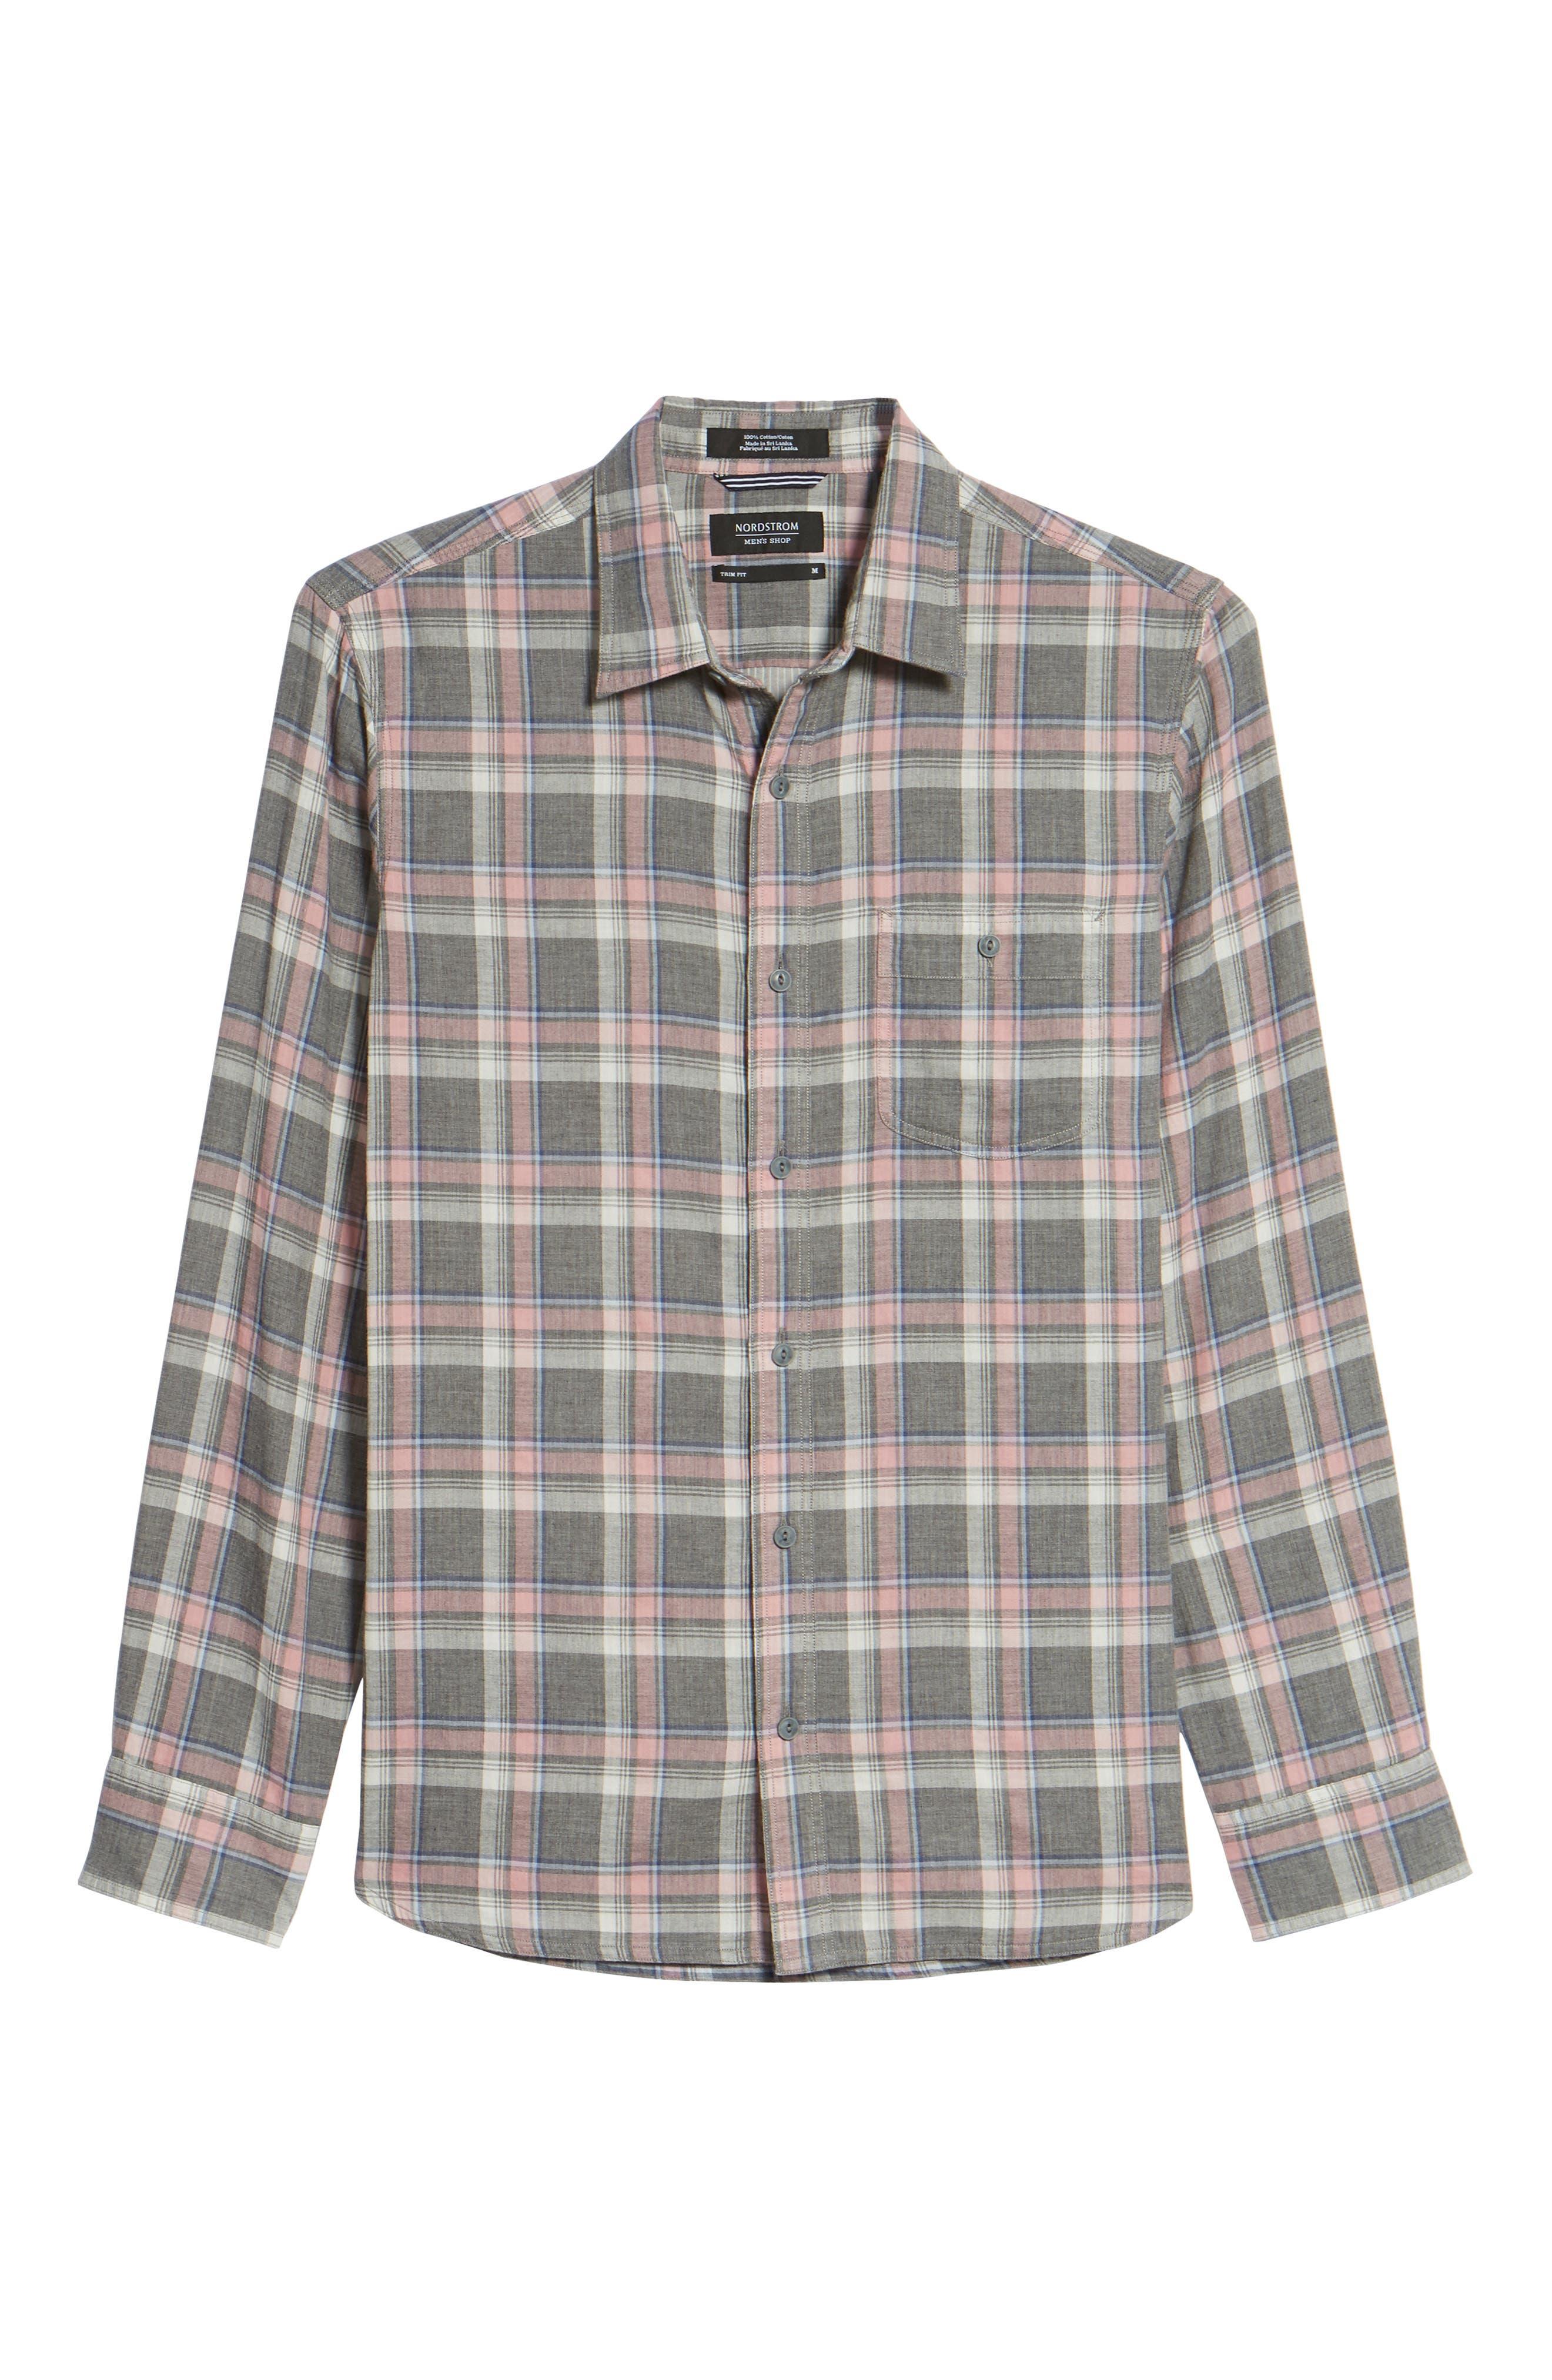 Trim Fit Utility Duofold Sport Shirt,                             Alternate thumbnail 6, color,                             Grey Paloma Pink Plaid Duofold